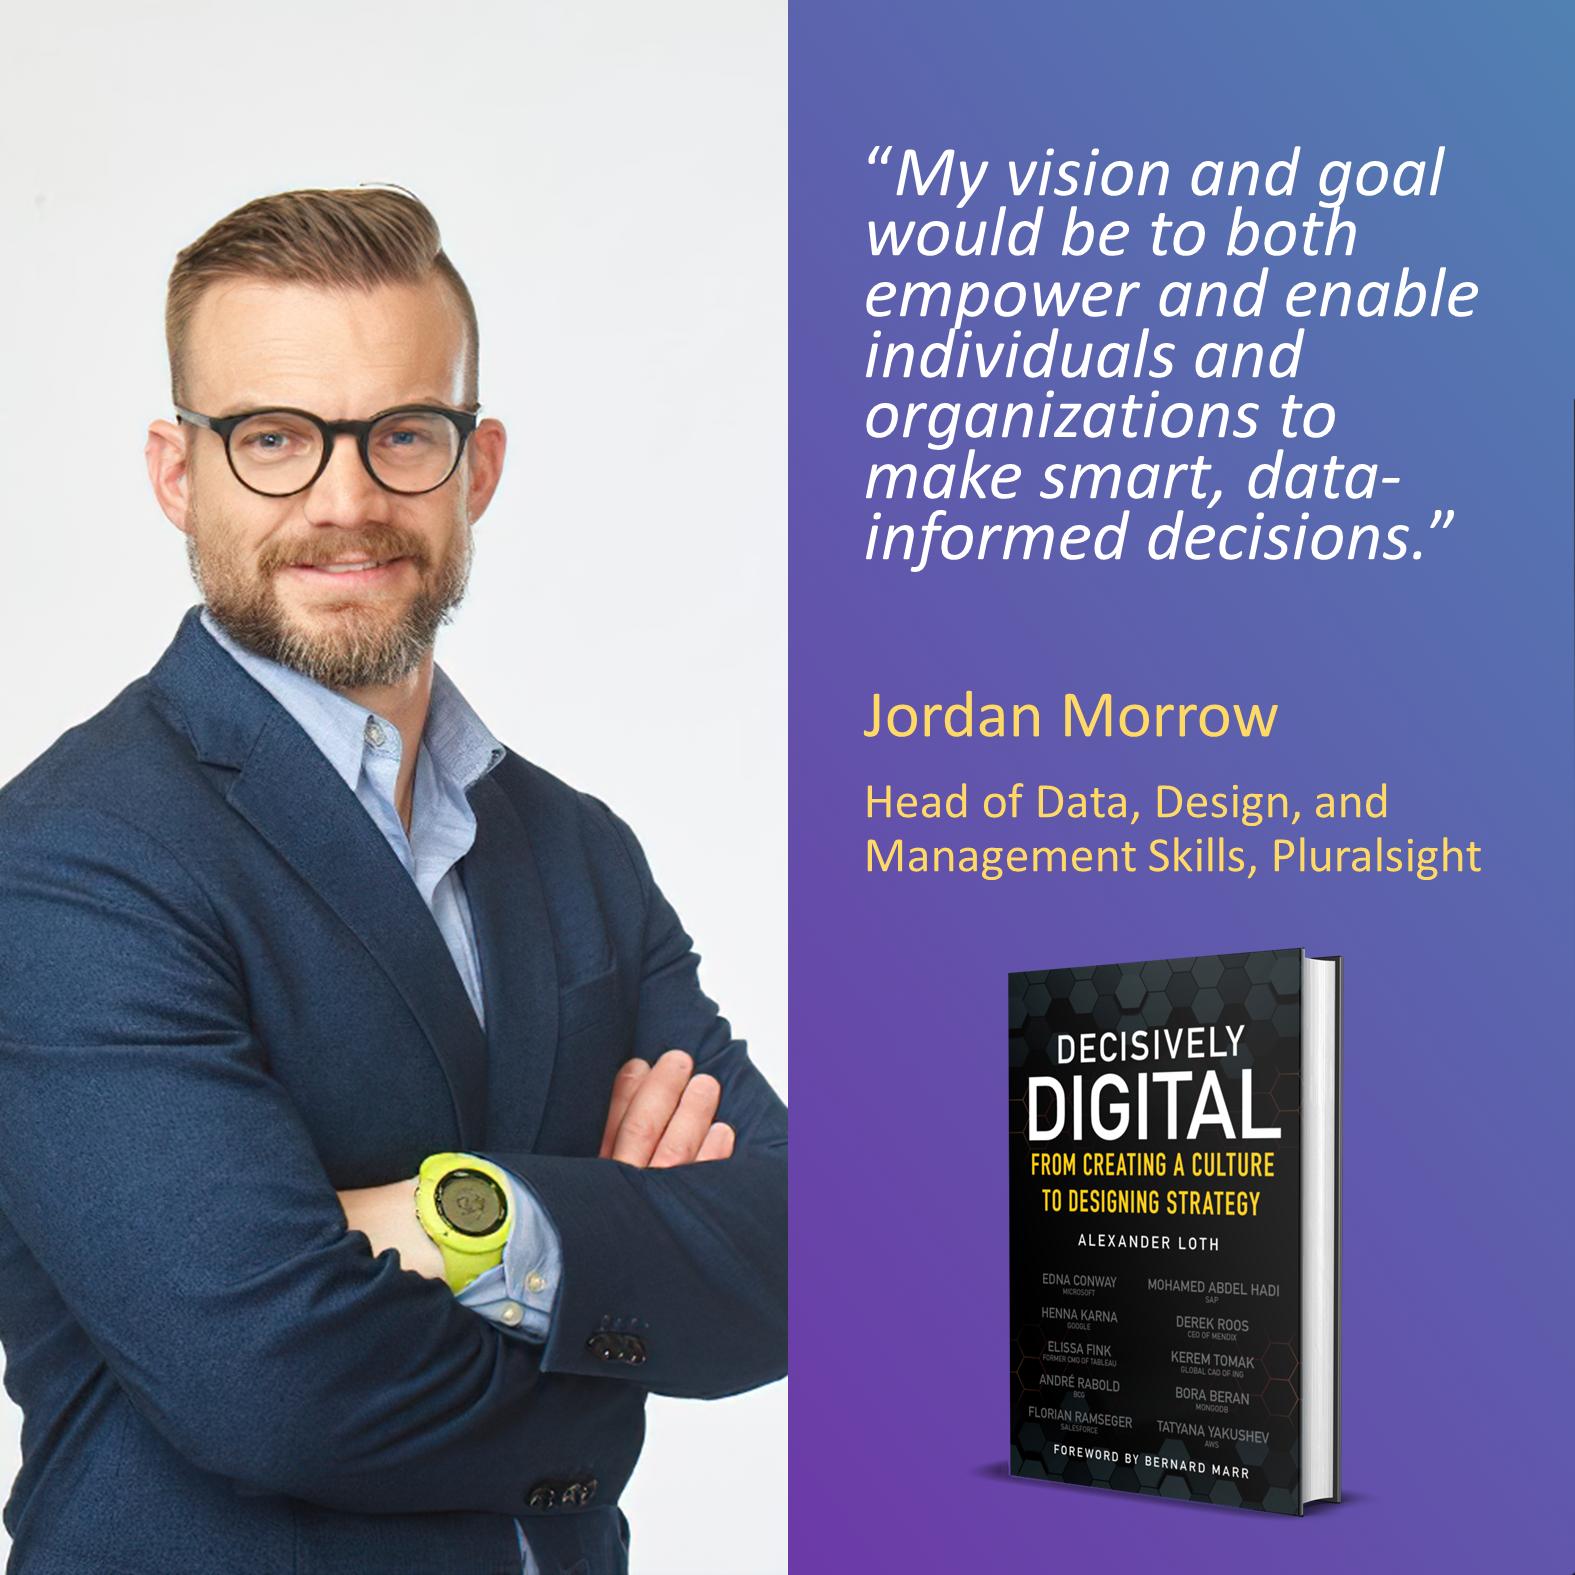 Jordan Morrow, Pluralsight